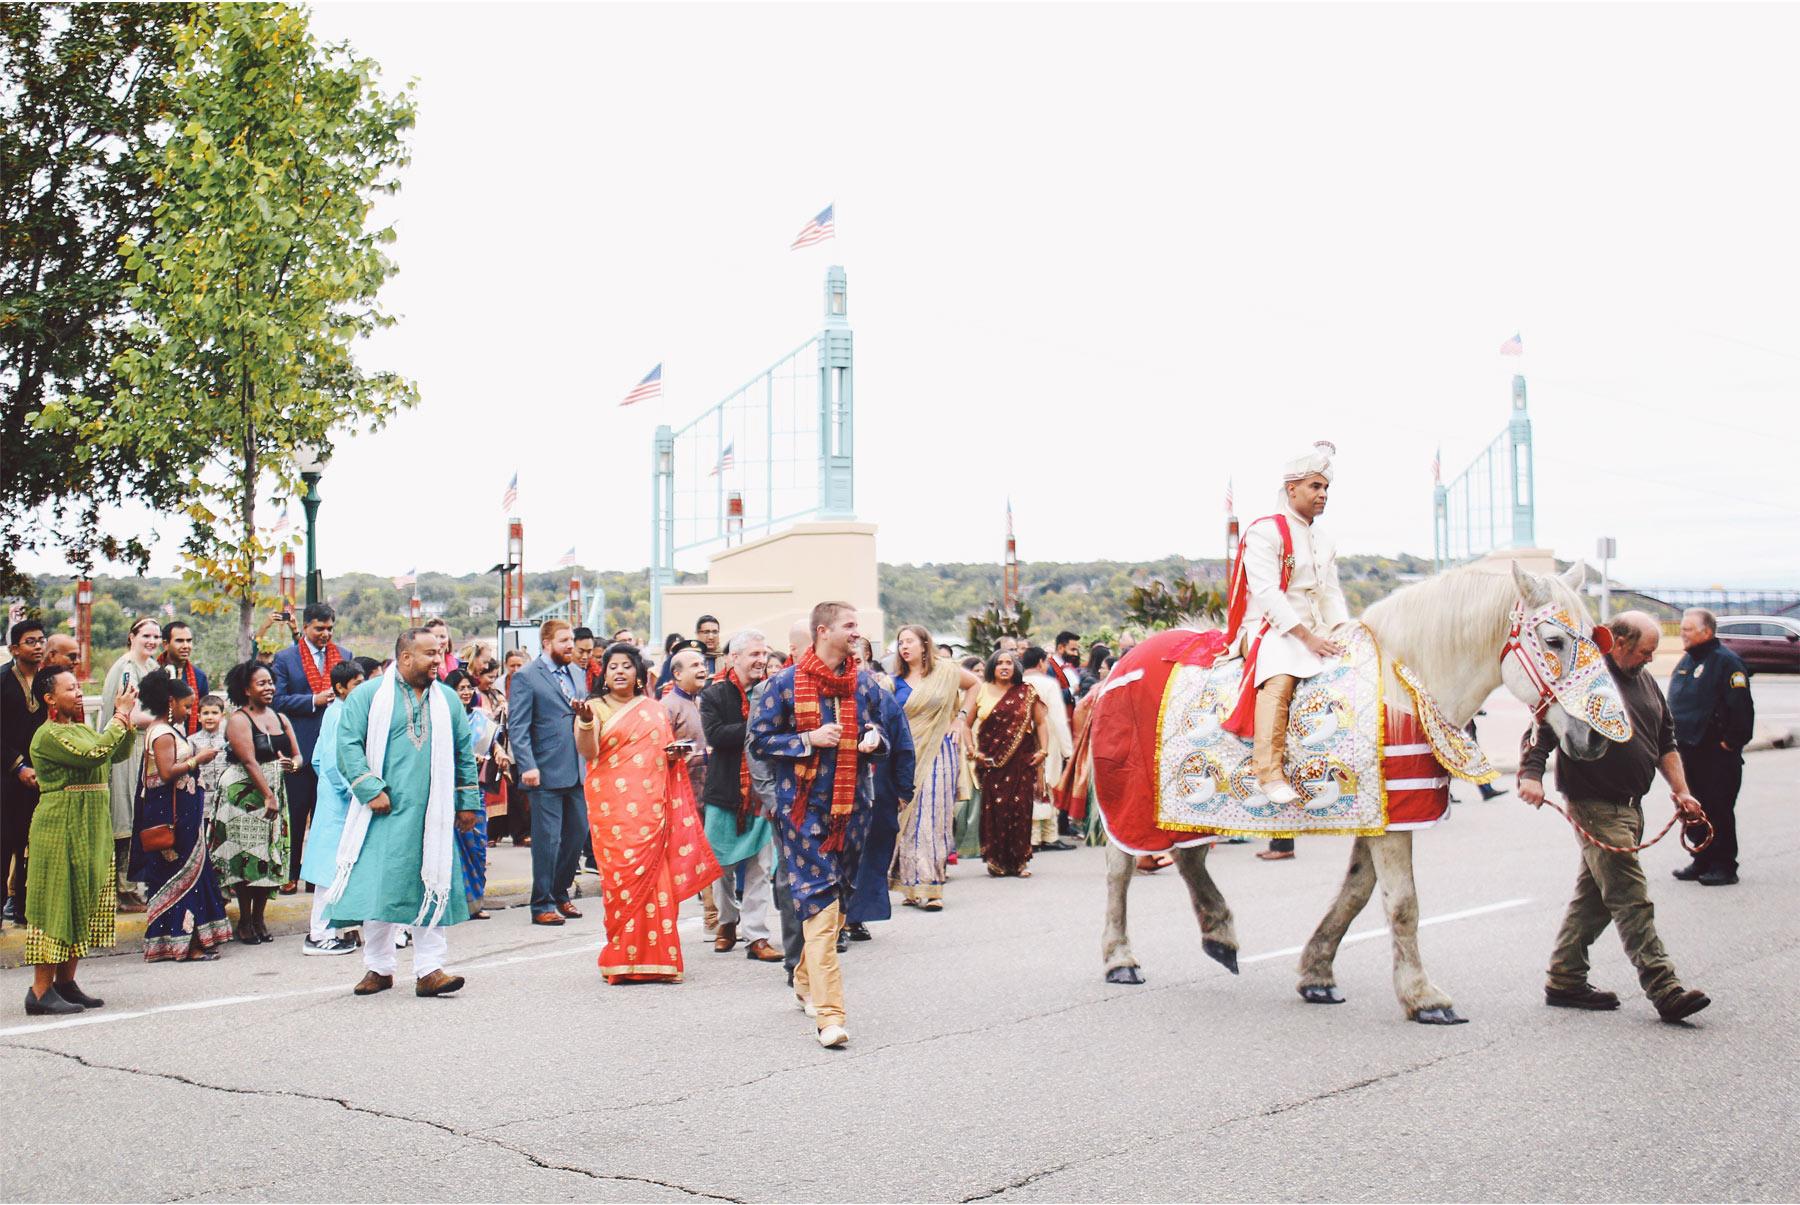 03-St-Paul-Minnesota-Wedding-Photography-by-Vick-Photography-Intercontinental-St-Paul-Riverfront-Traditional-Indian-Wedding-Baraat-Horse-Groom-Leena-and-Michael.jpg